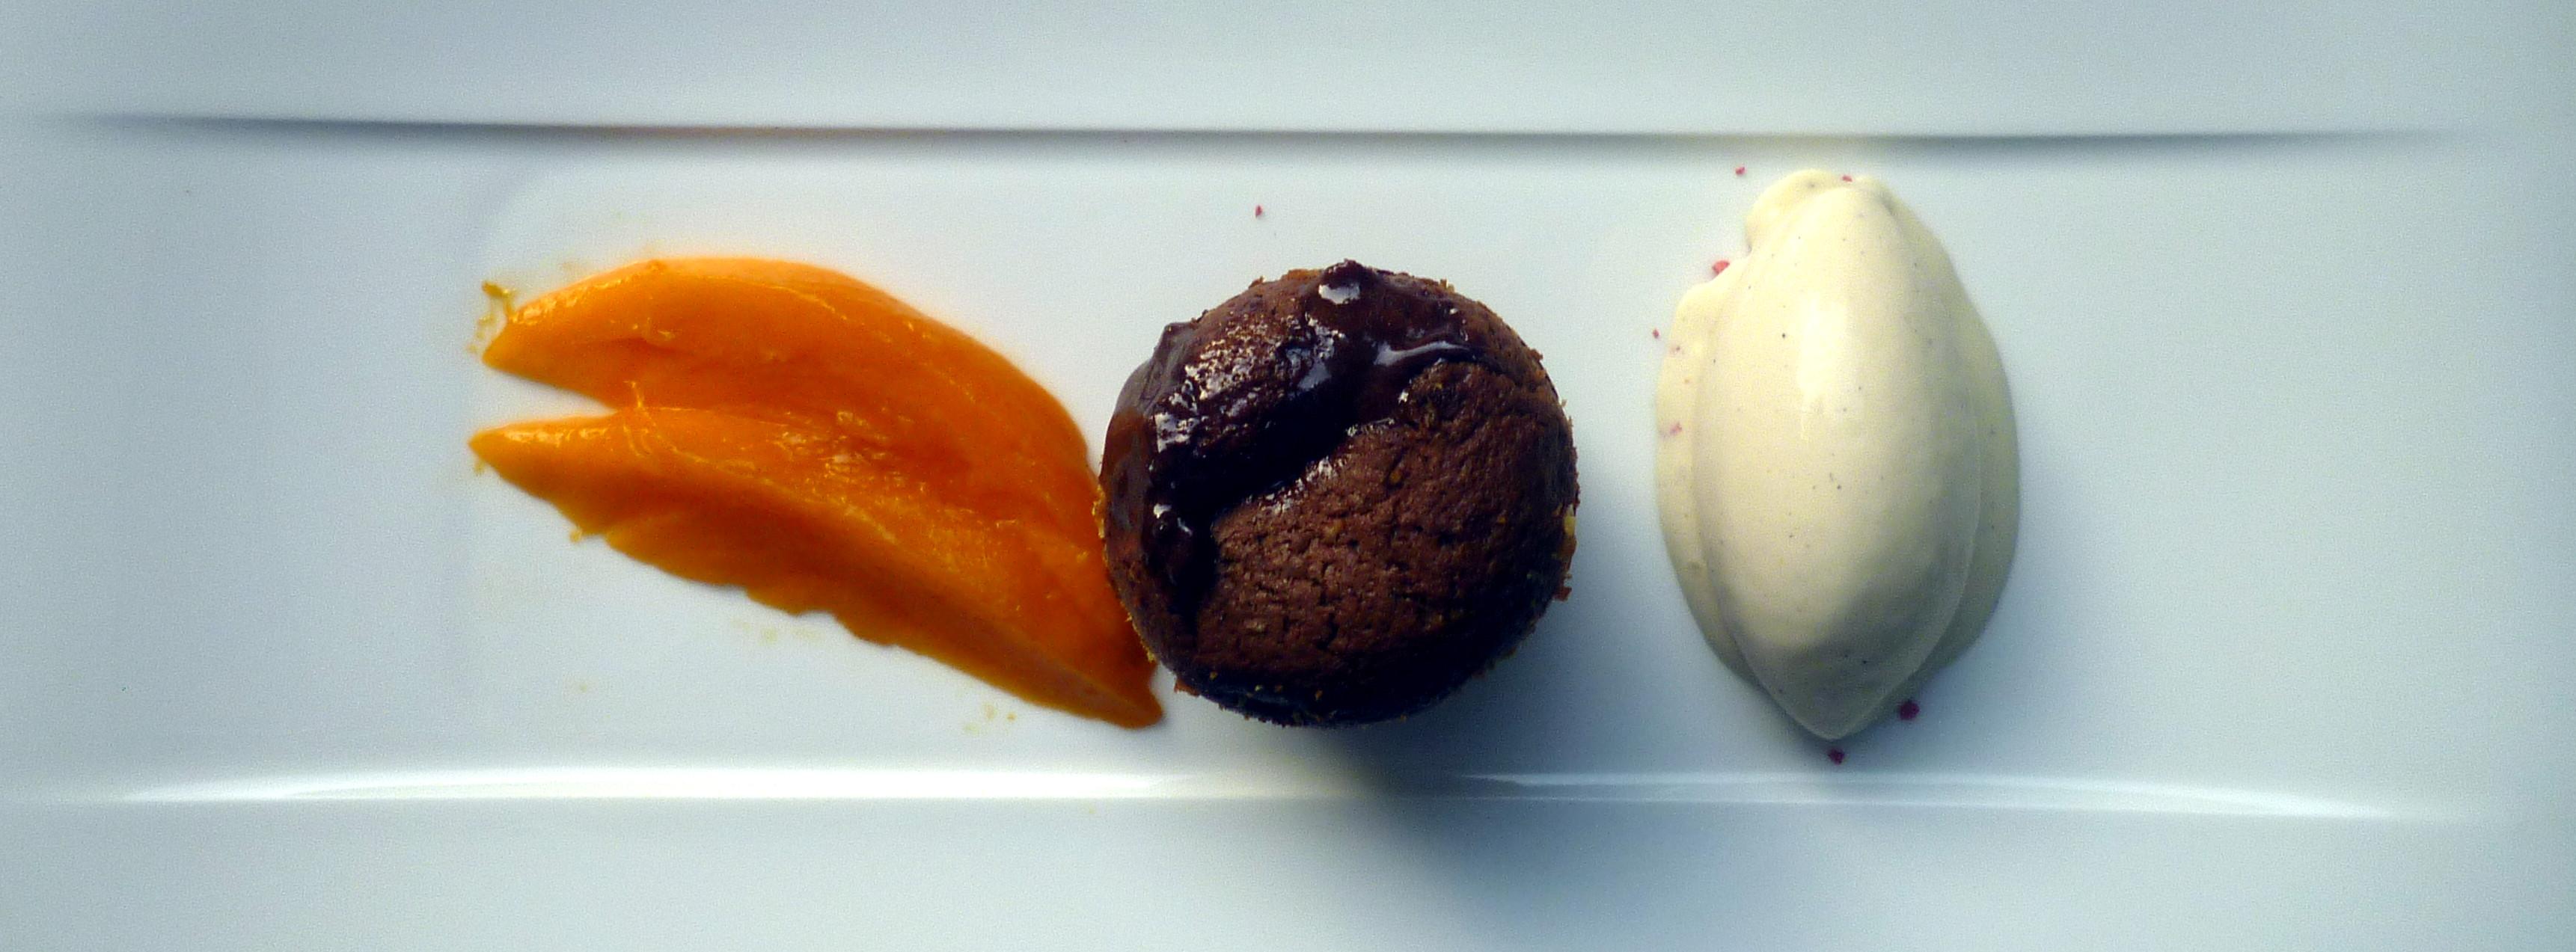 05 Dessert